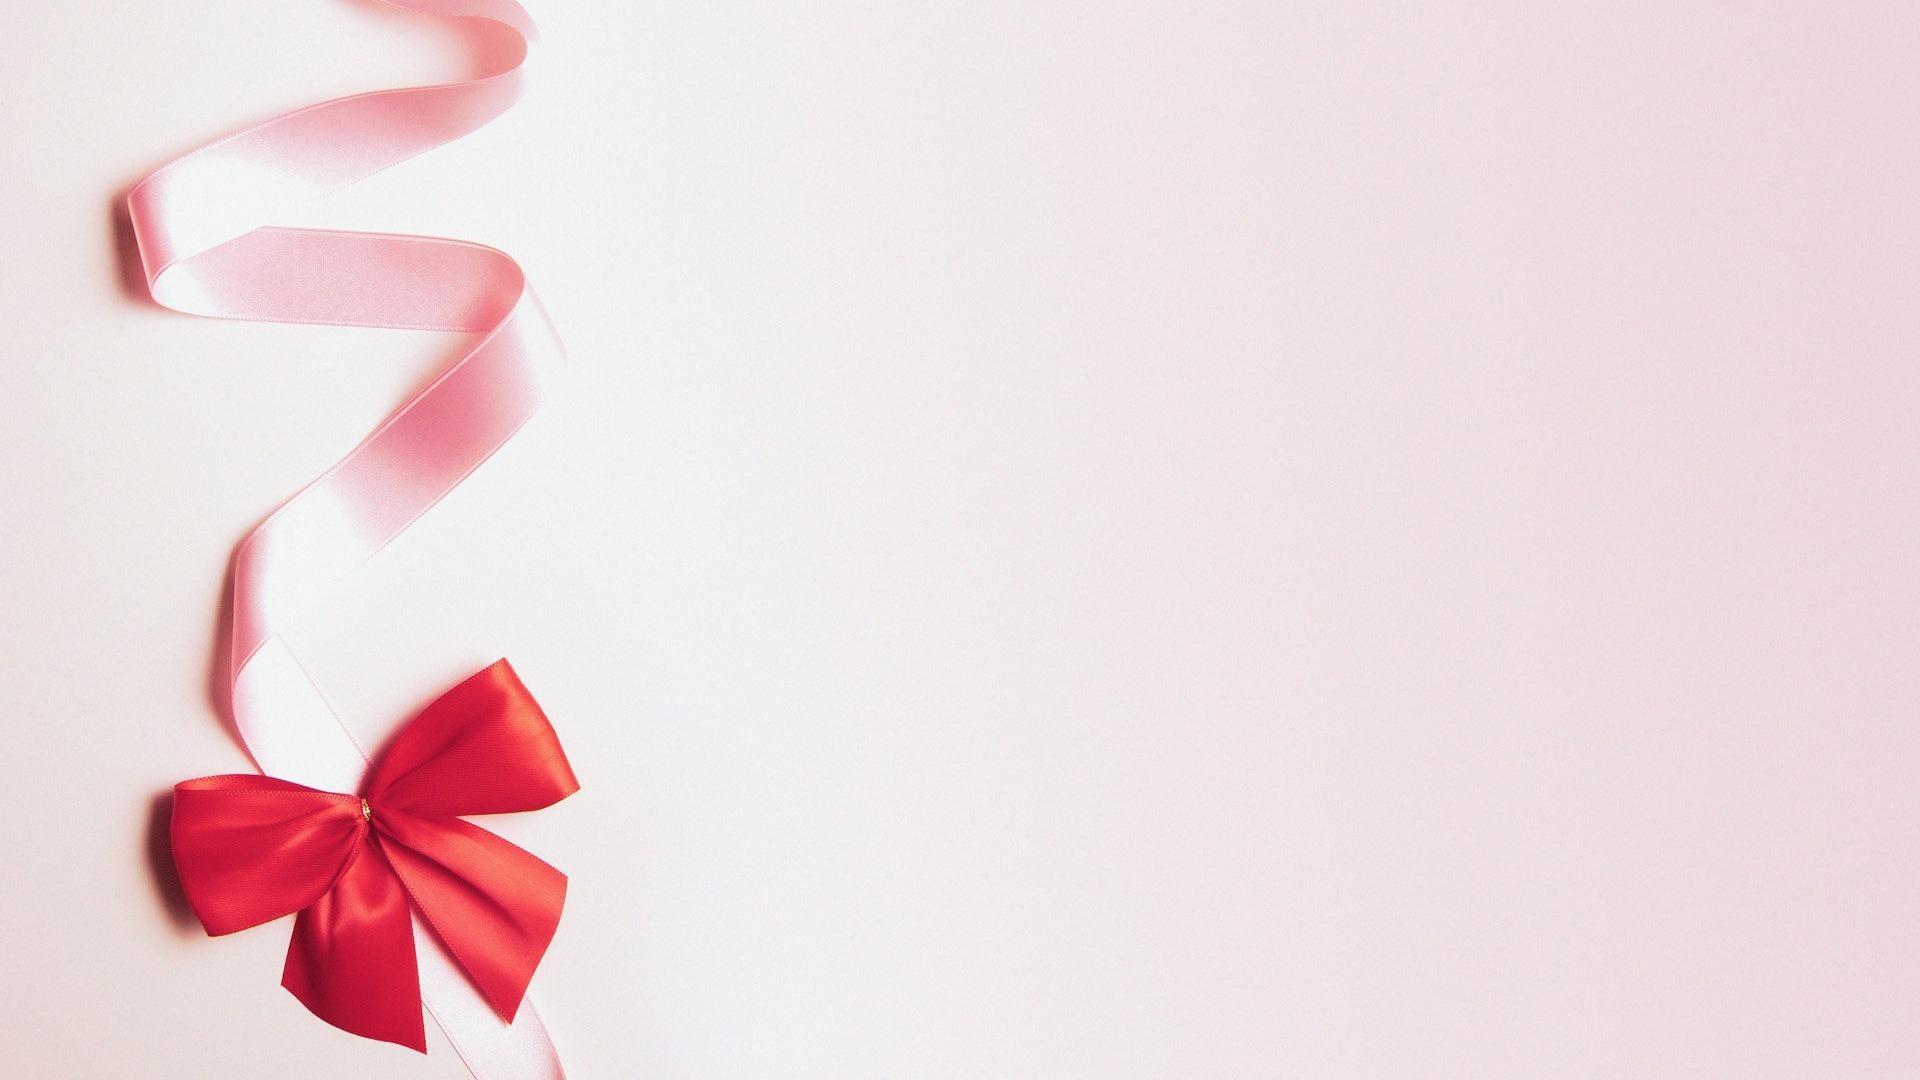 pink ribbon wallpaper (44+ images)